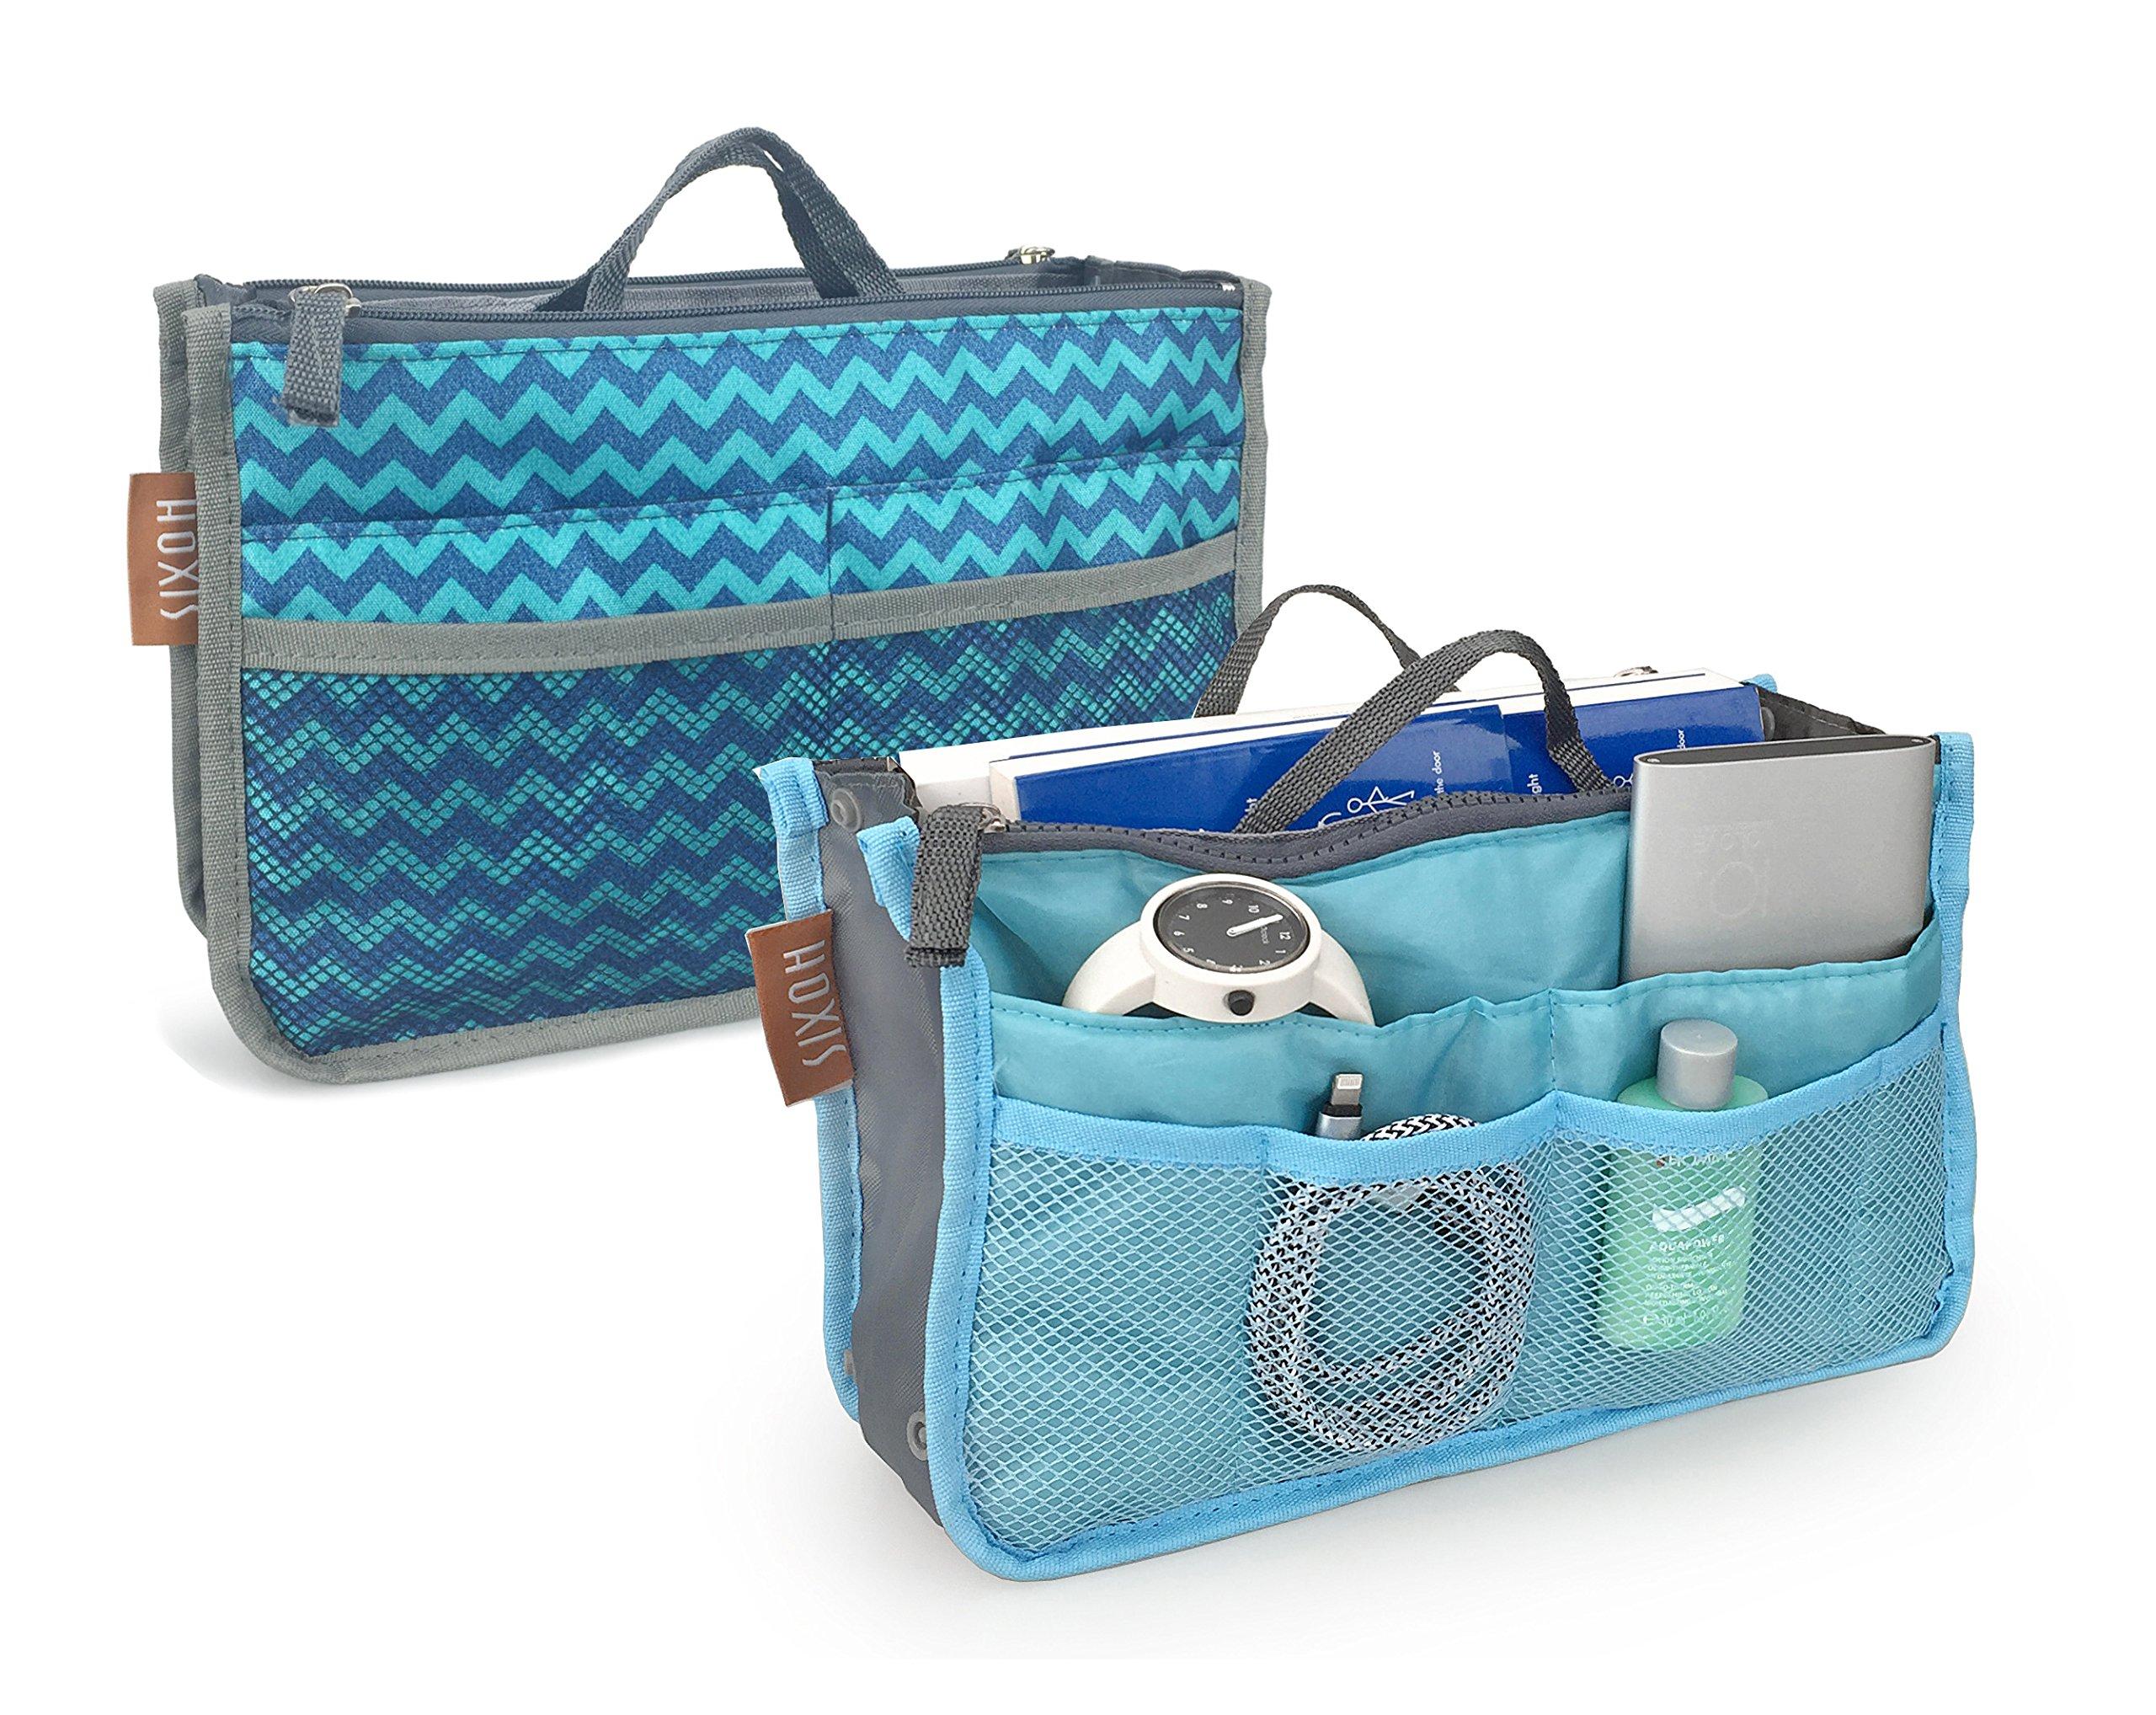 "Hoxis Insert Organizer 13 Pockets Organizer 10.6"" X 6.3"" Bag in Bag Pack of 2(Chevron&Blue)"